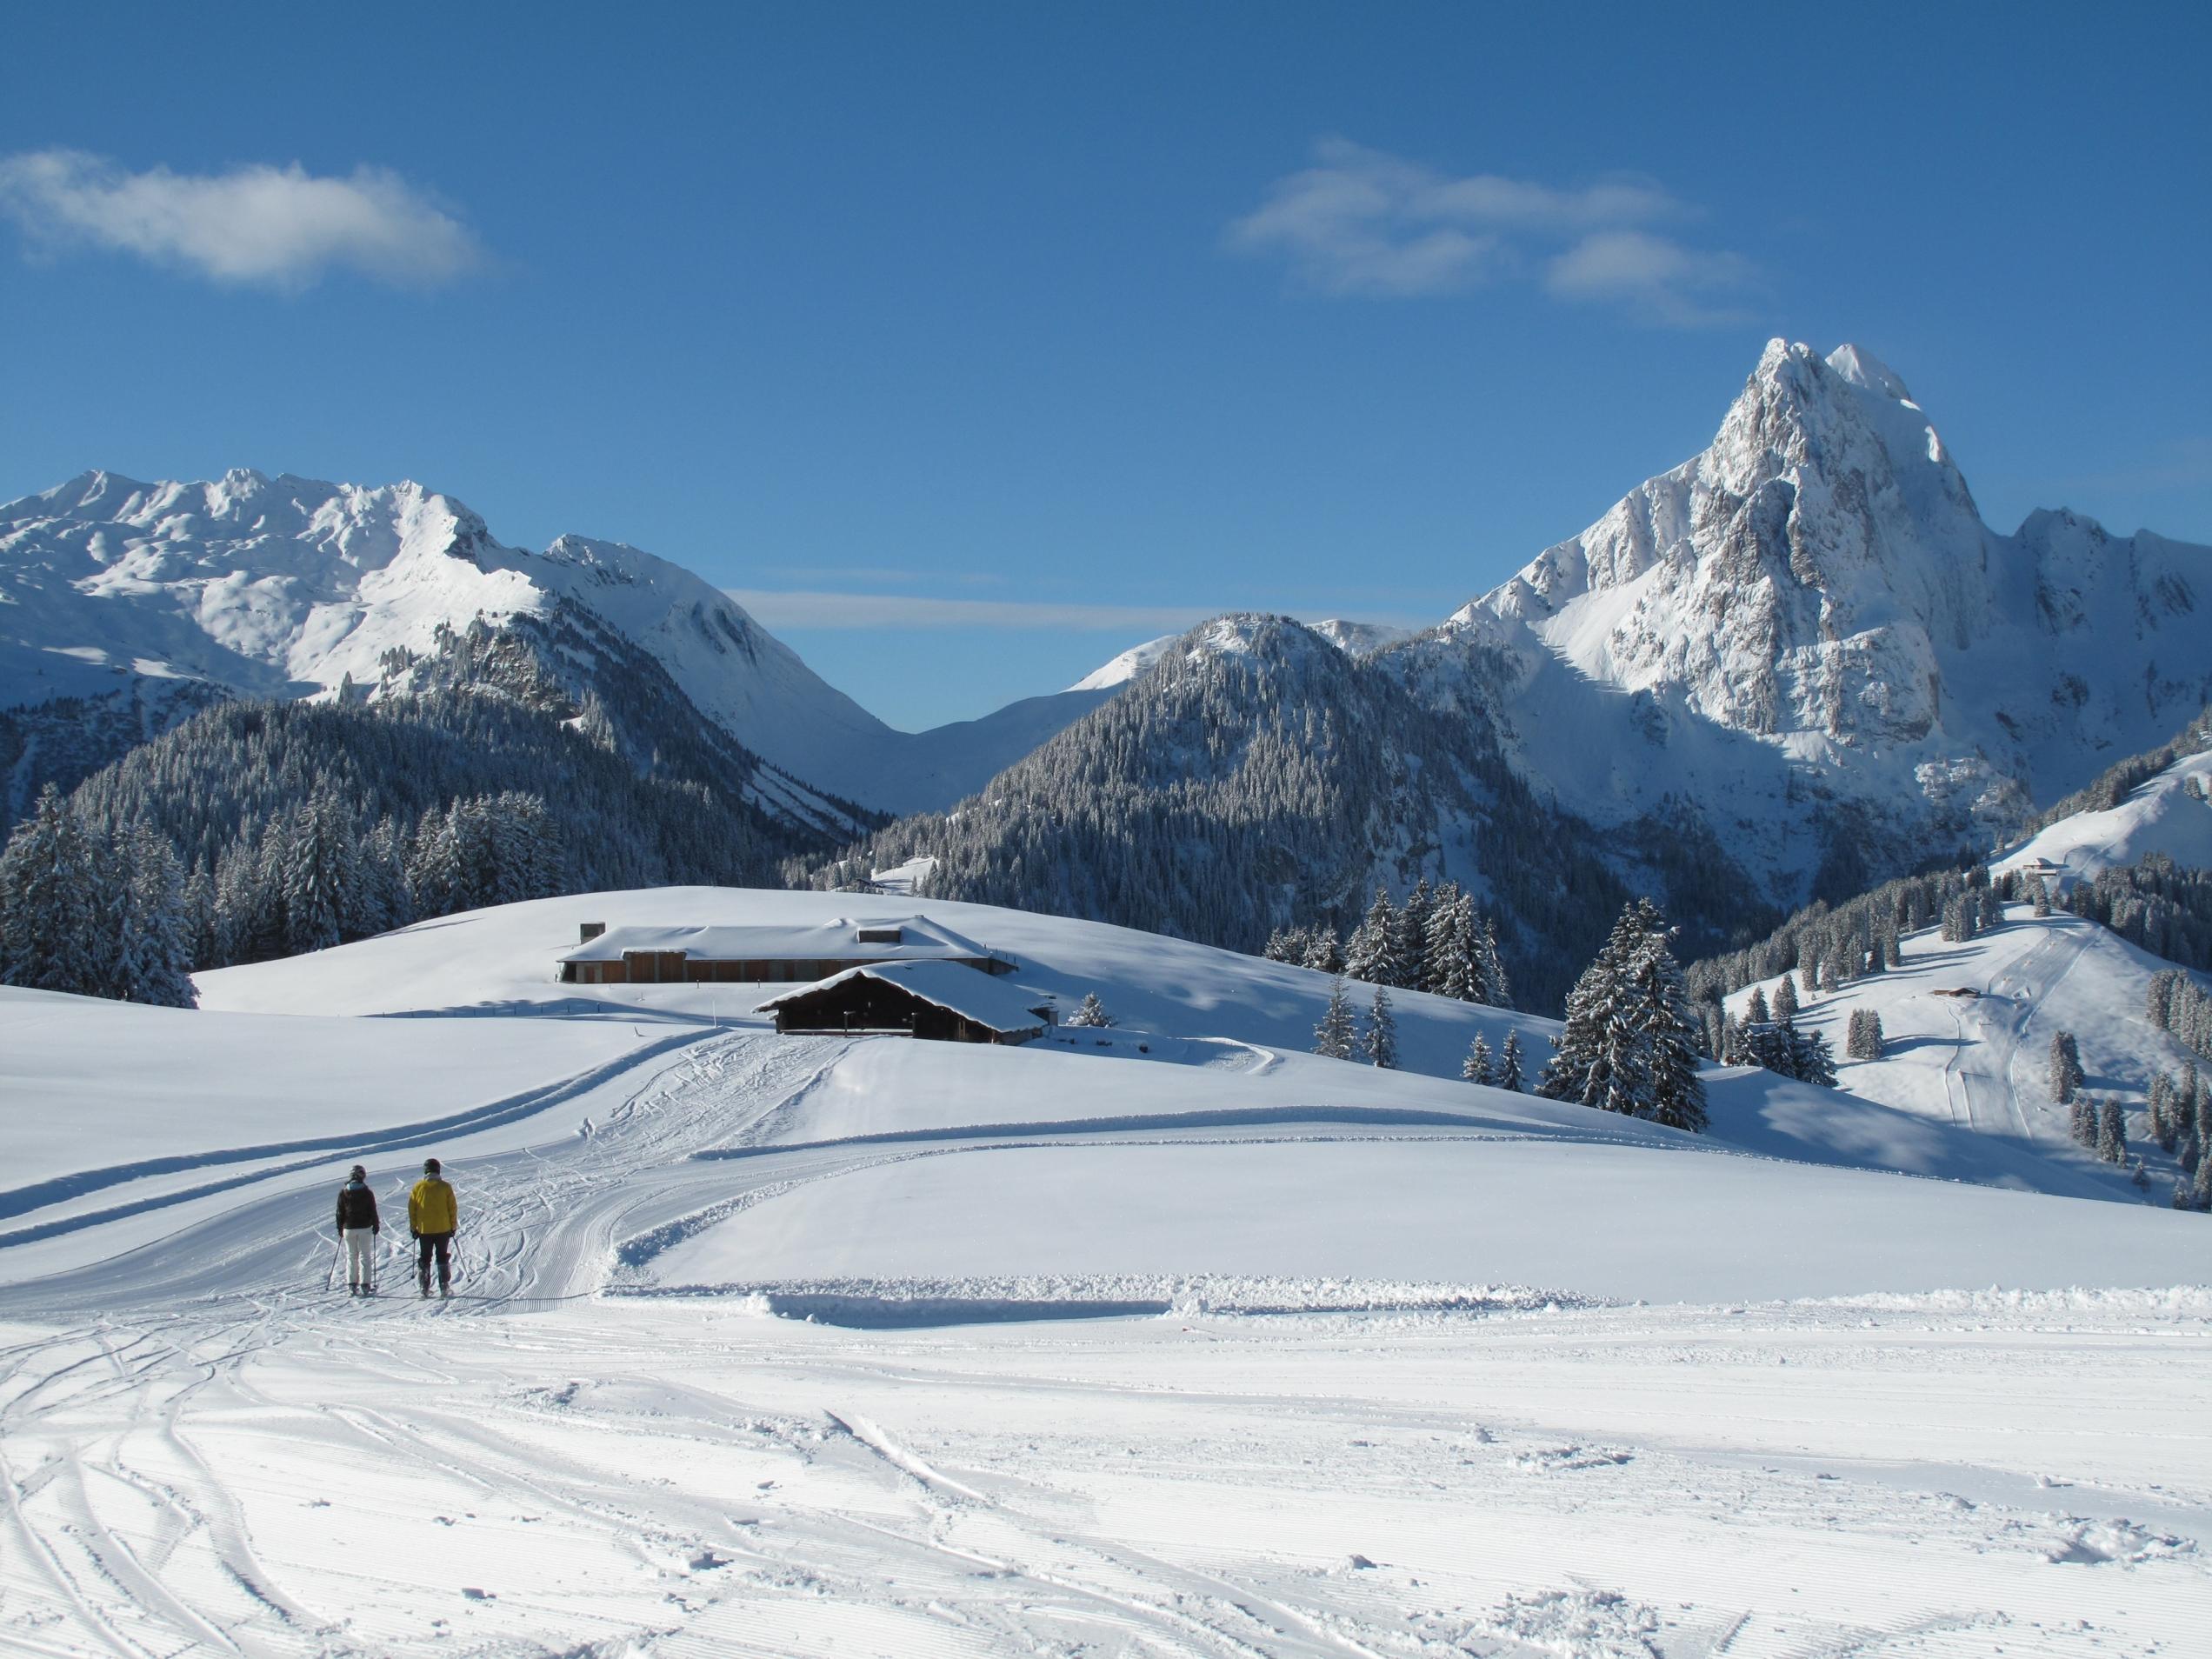 Gstaad Ski Resort Switzerland